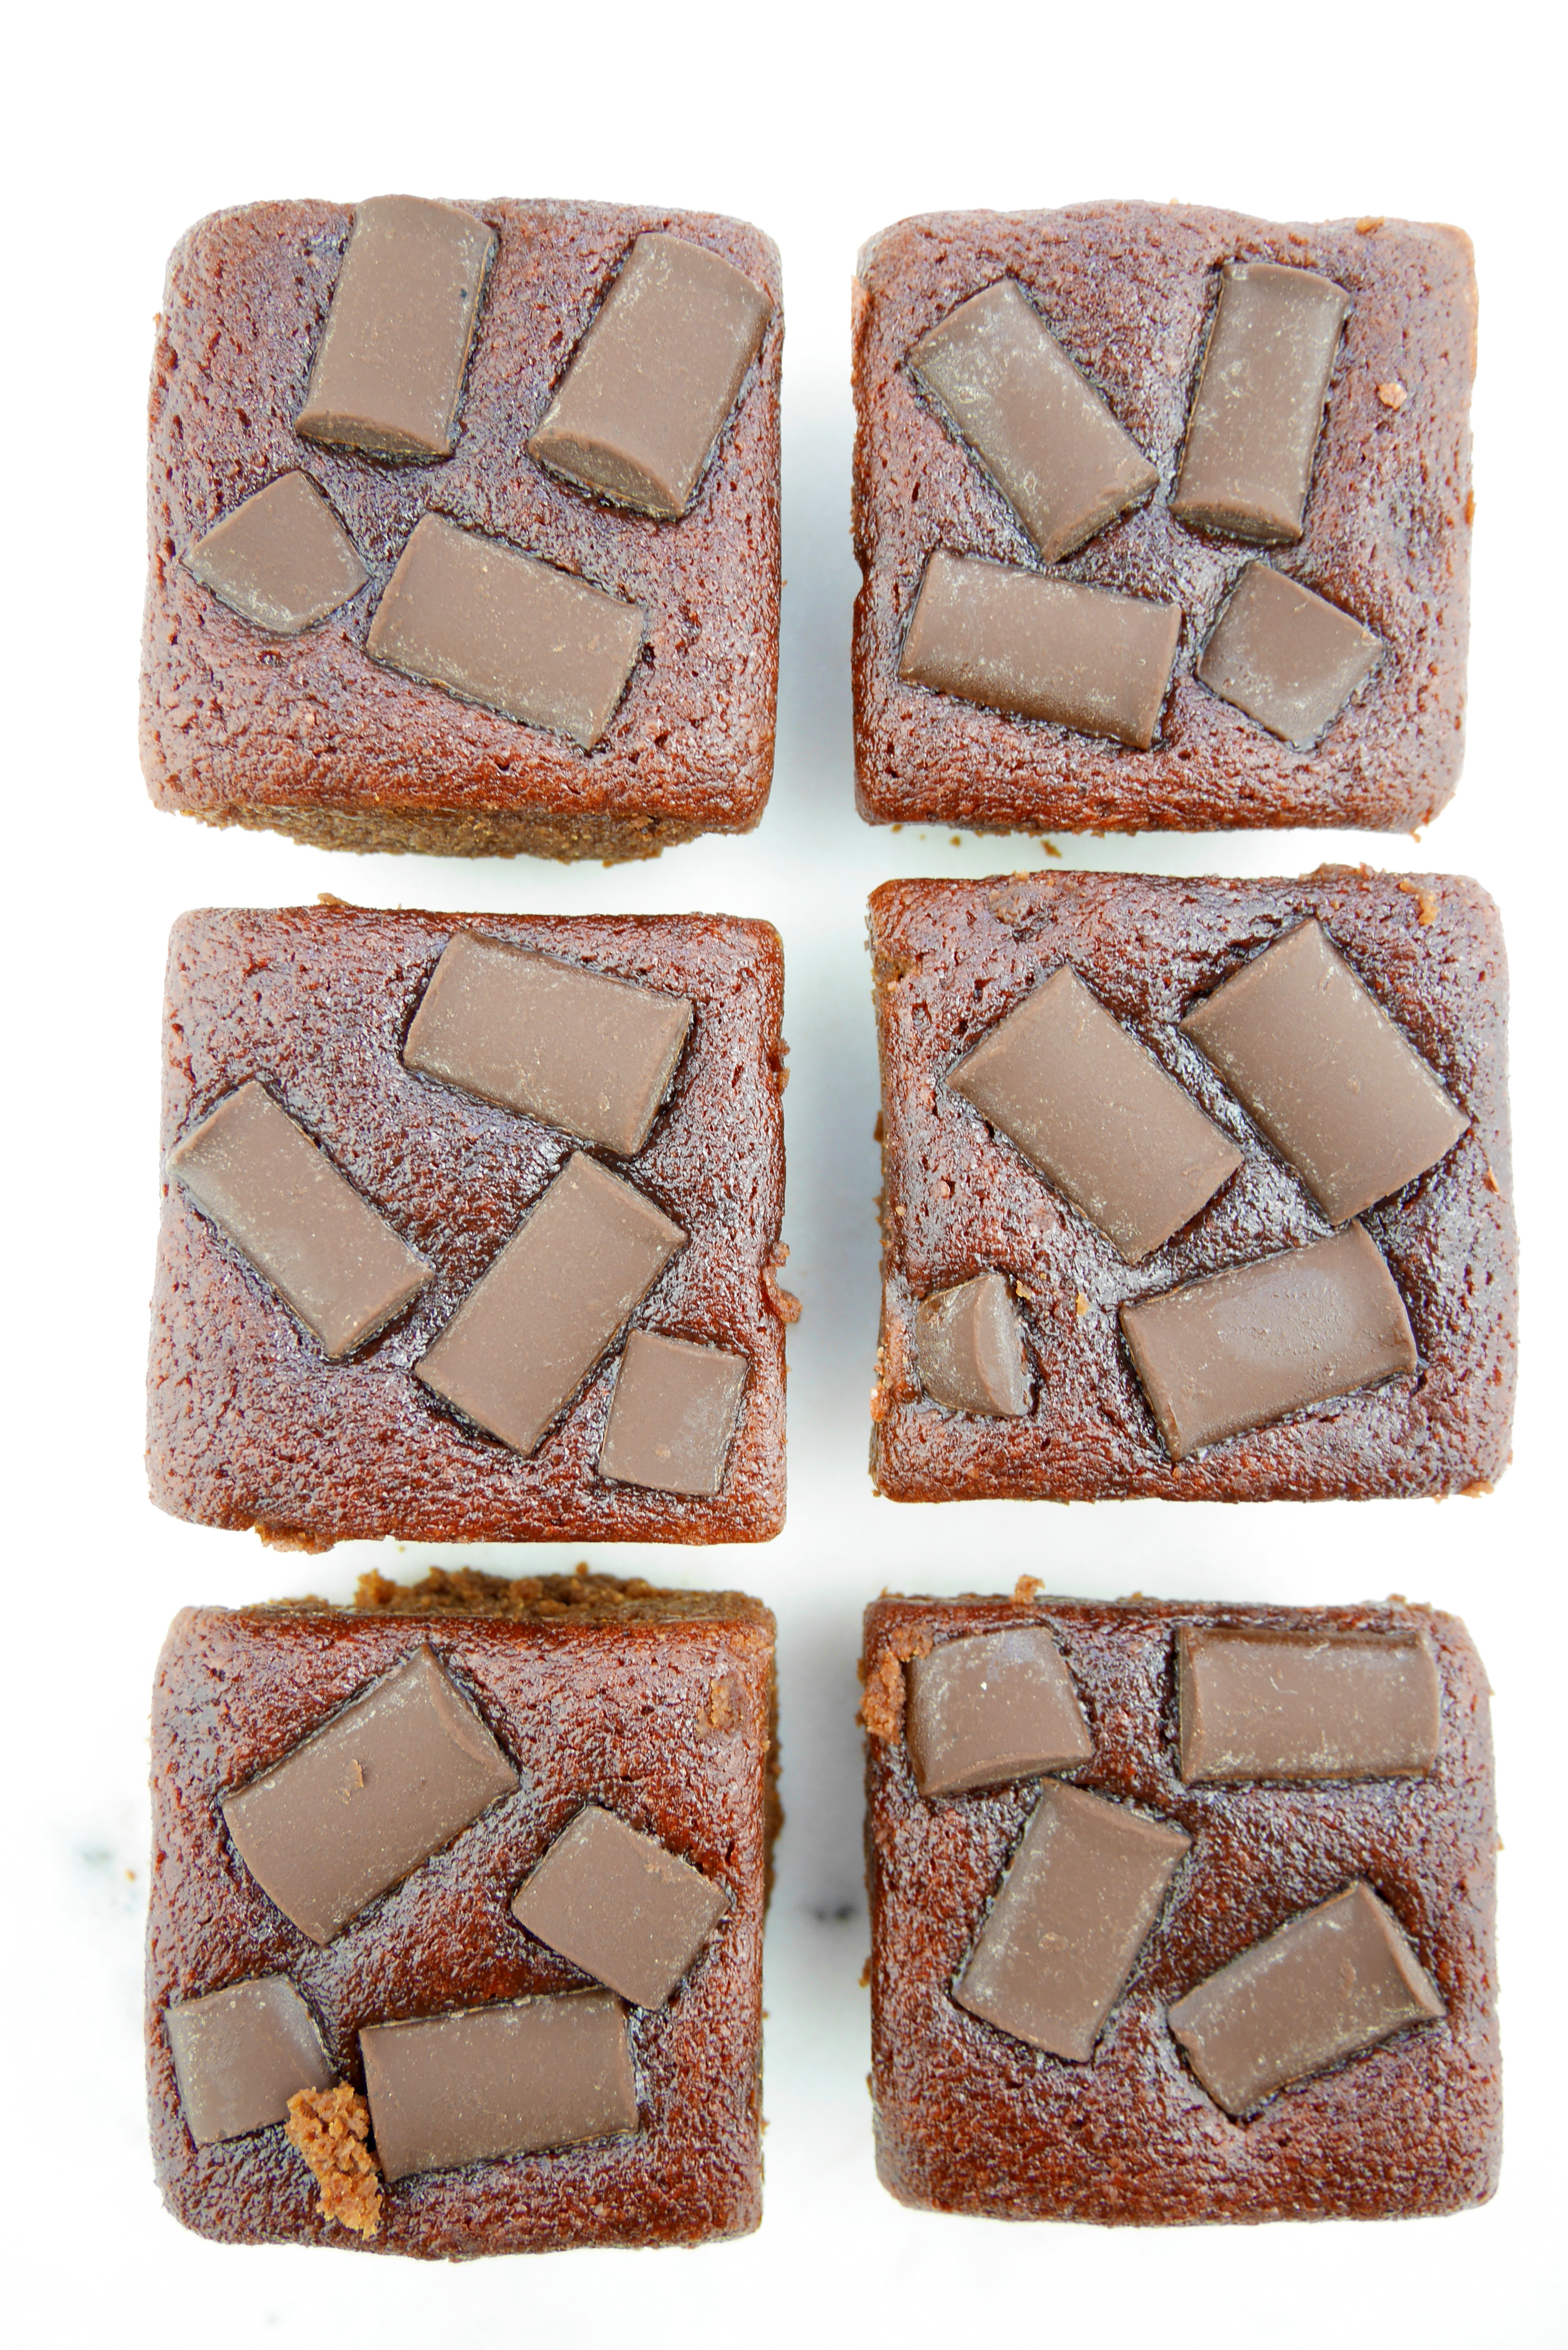 bareorganics beet root brownies